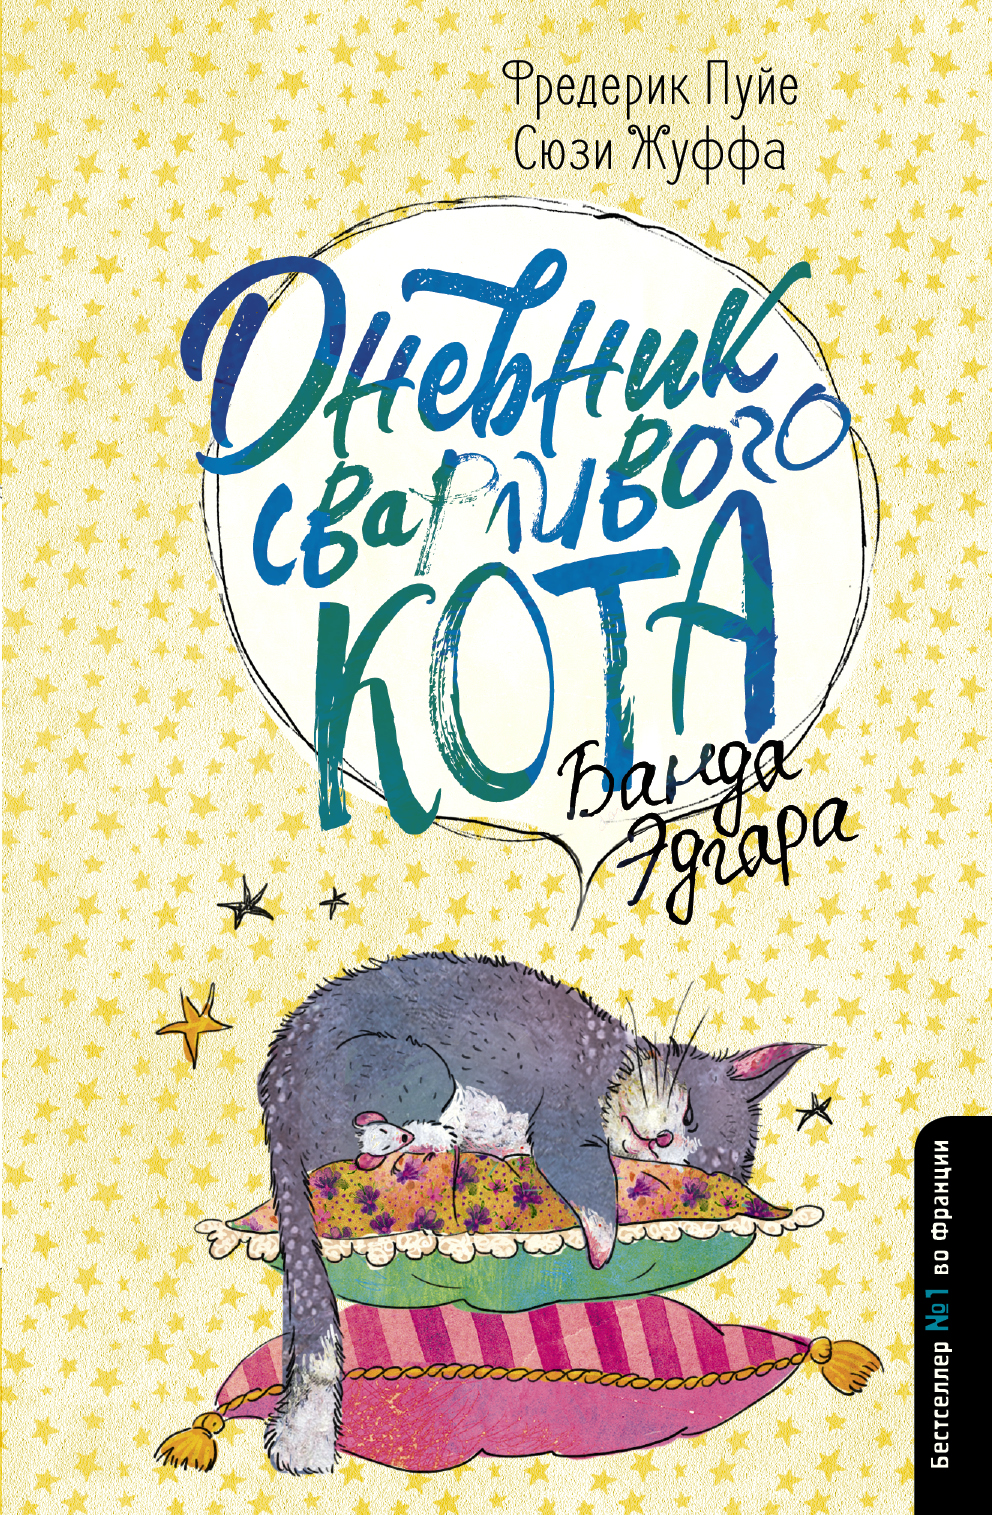 Дневник сварливого кота. Банда Эдгара